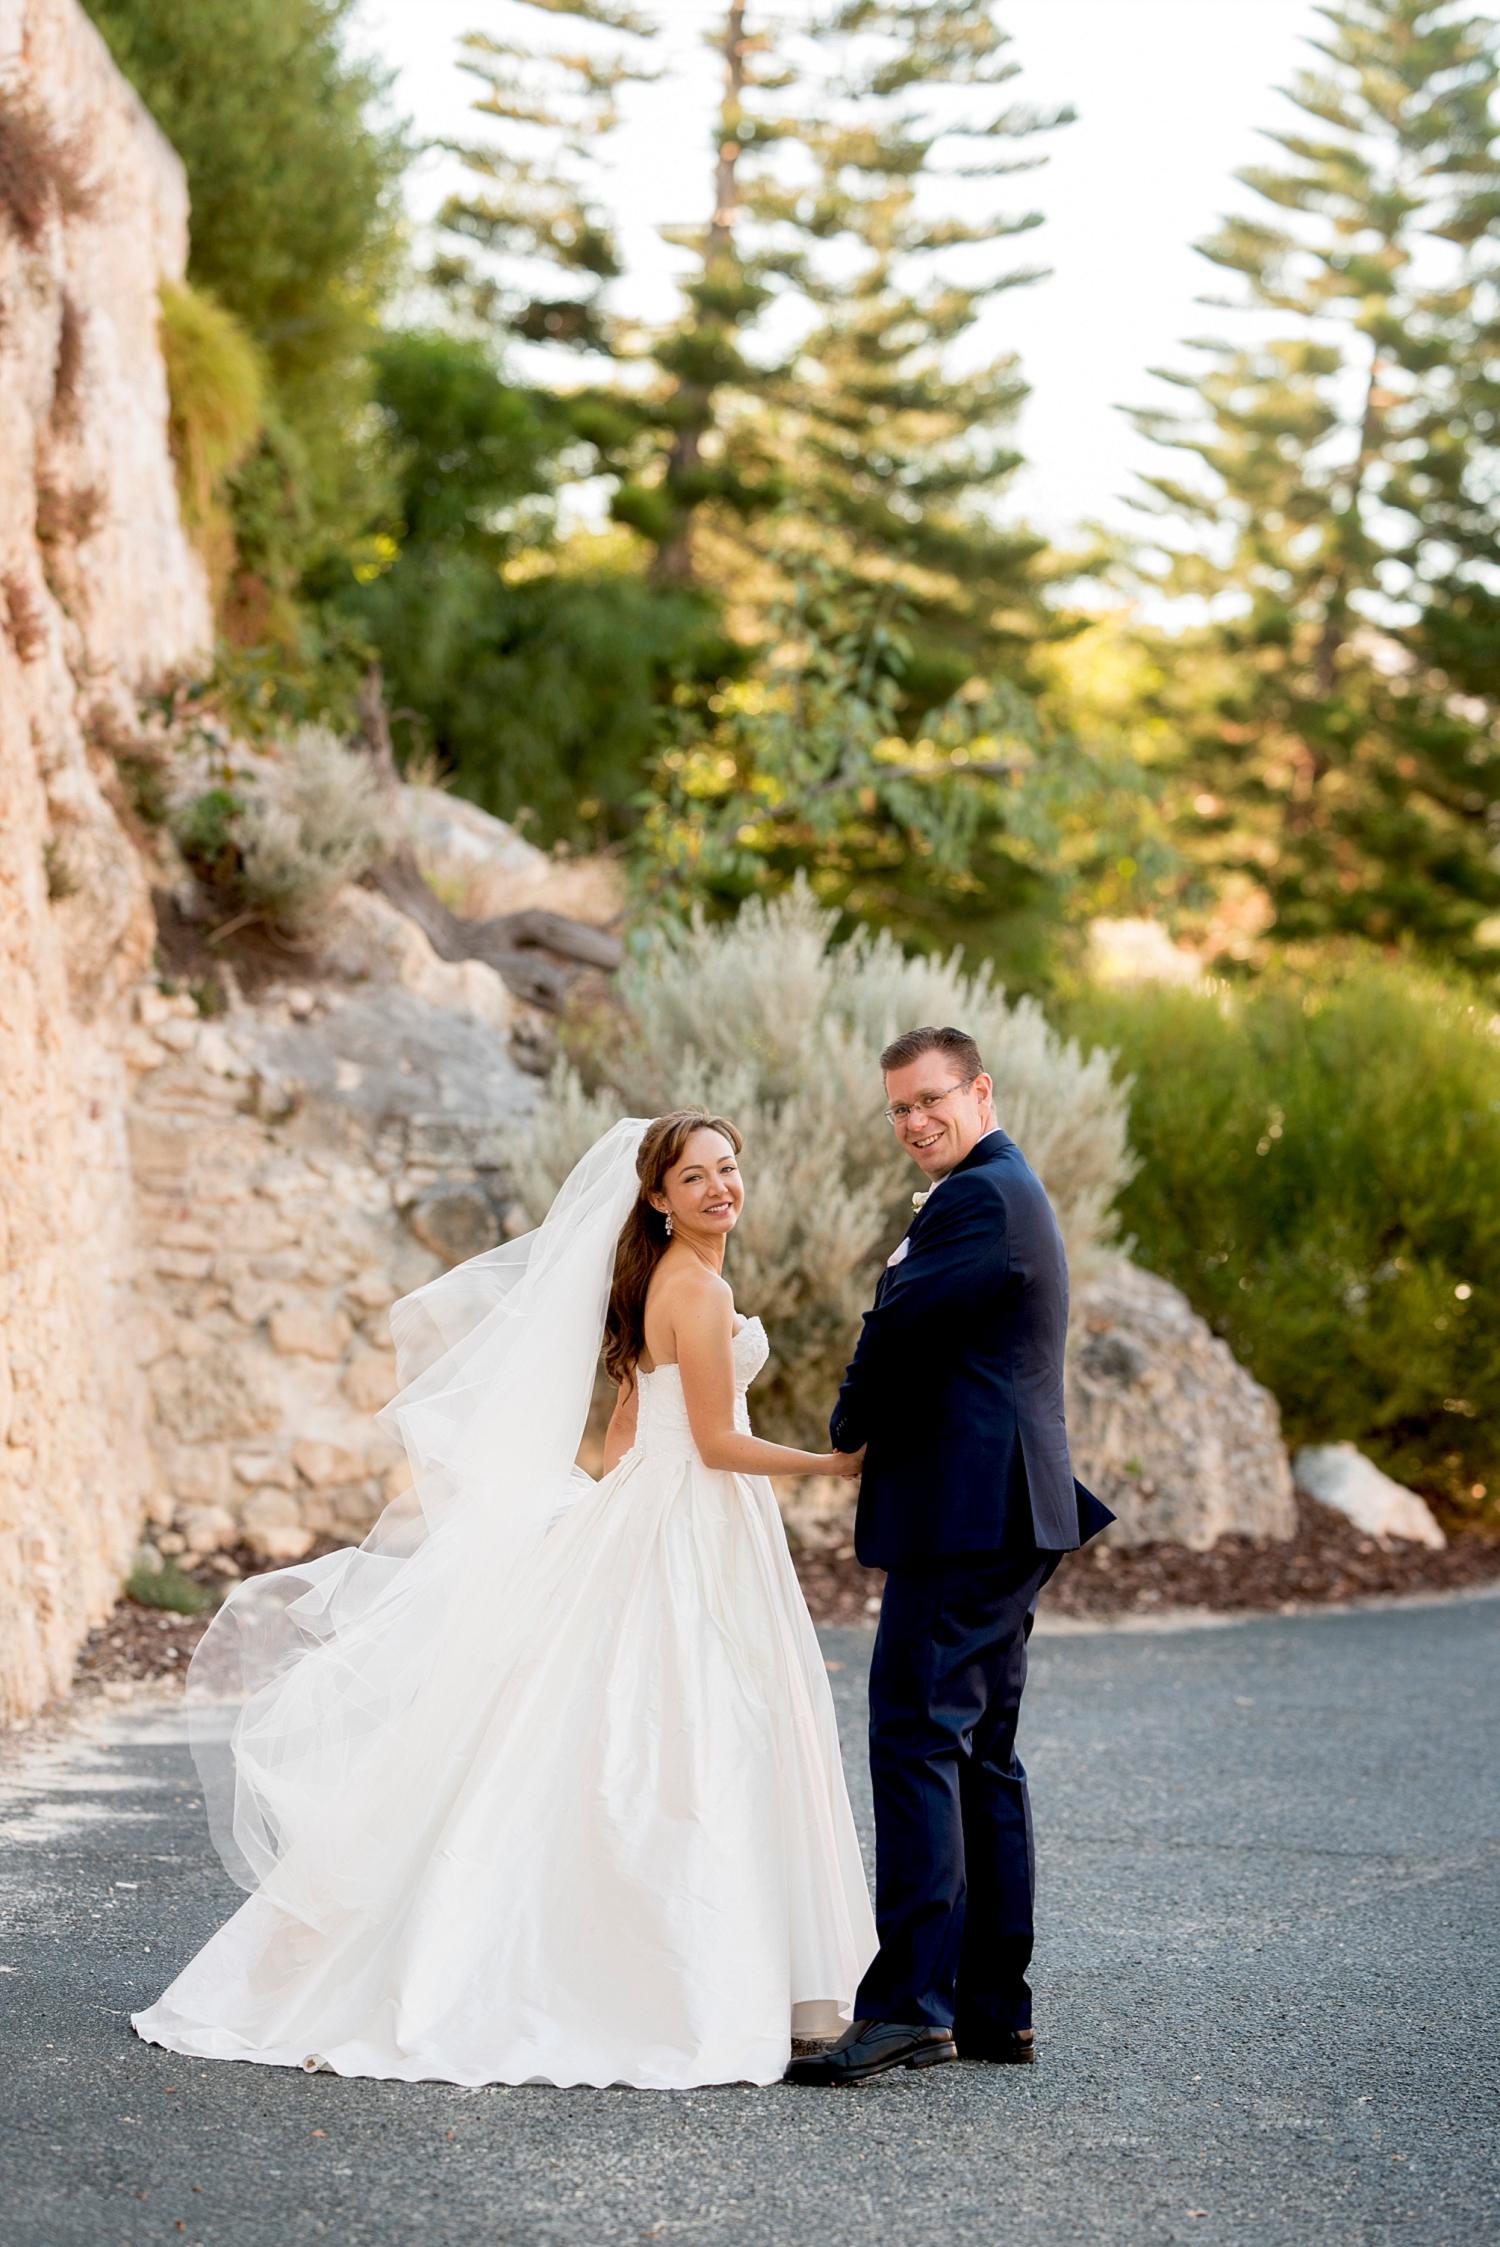 128_perth wedding photographer deray simcoe .jpg